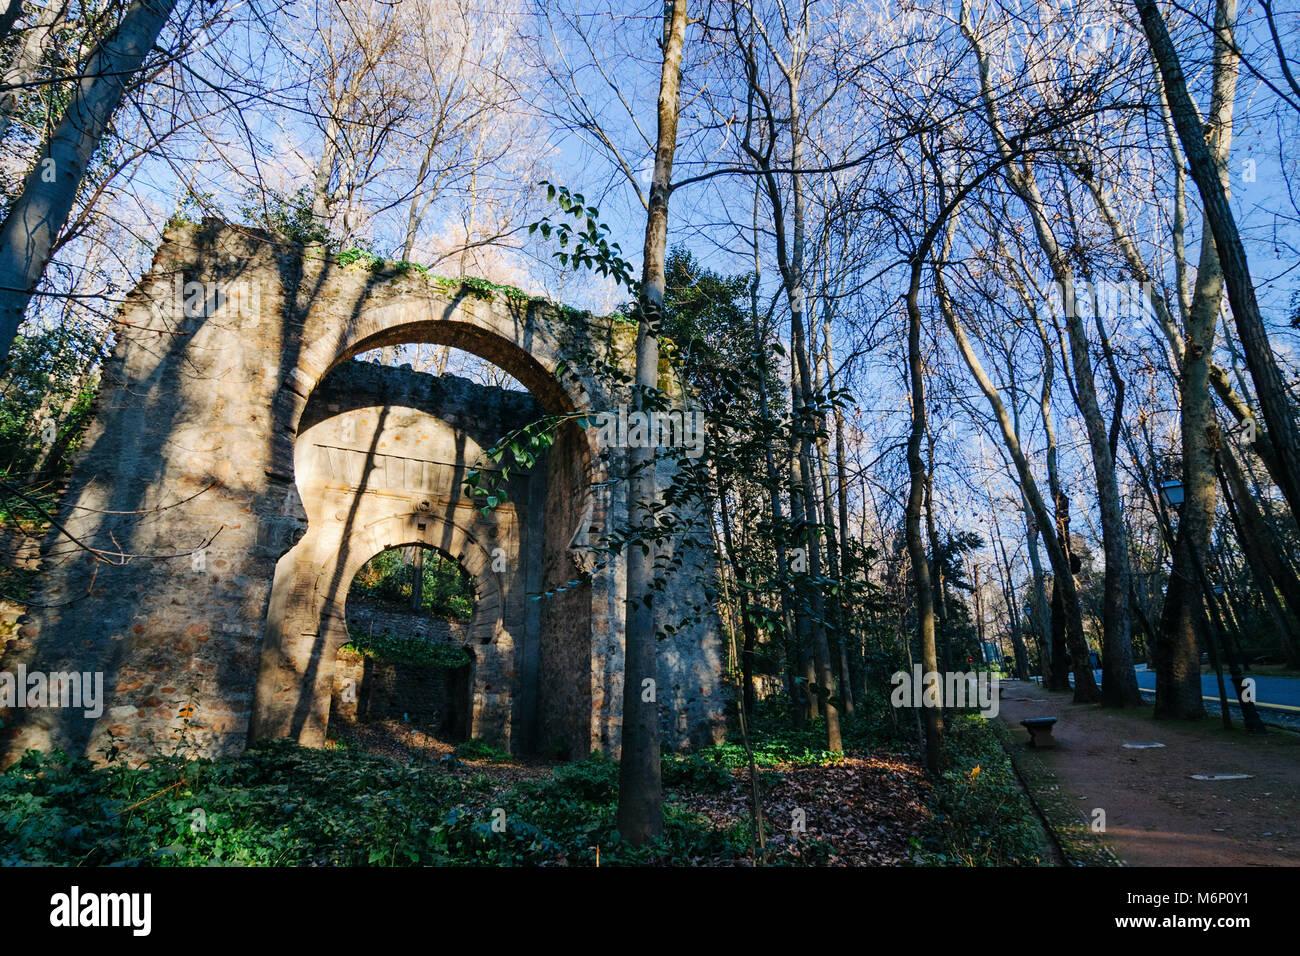 Granada, Andalusia, Spain. XI century Moorish Gate of the Ears (Arco de las Orejas), also called Bib-Arrambla gate - Stock Image